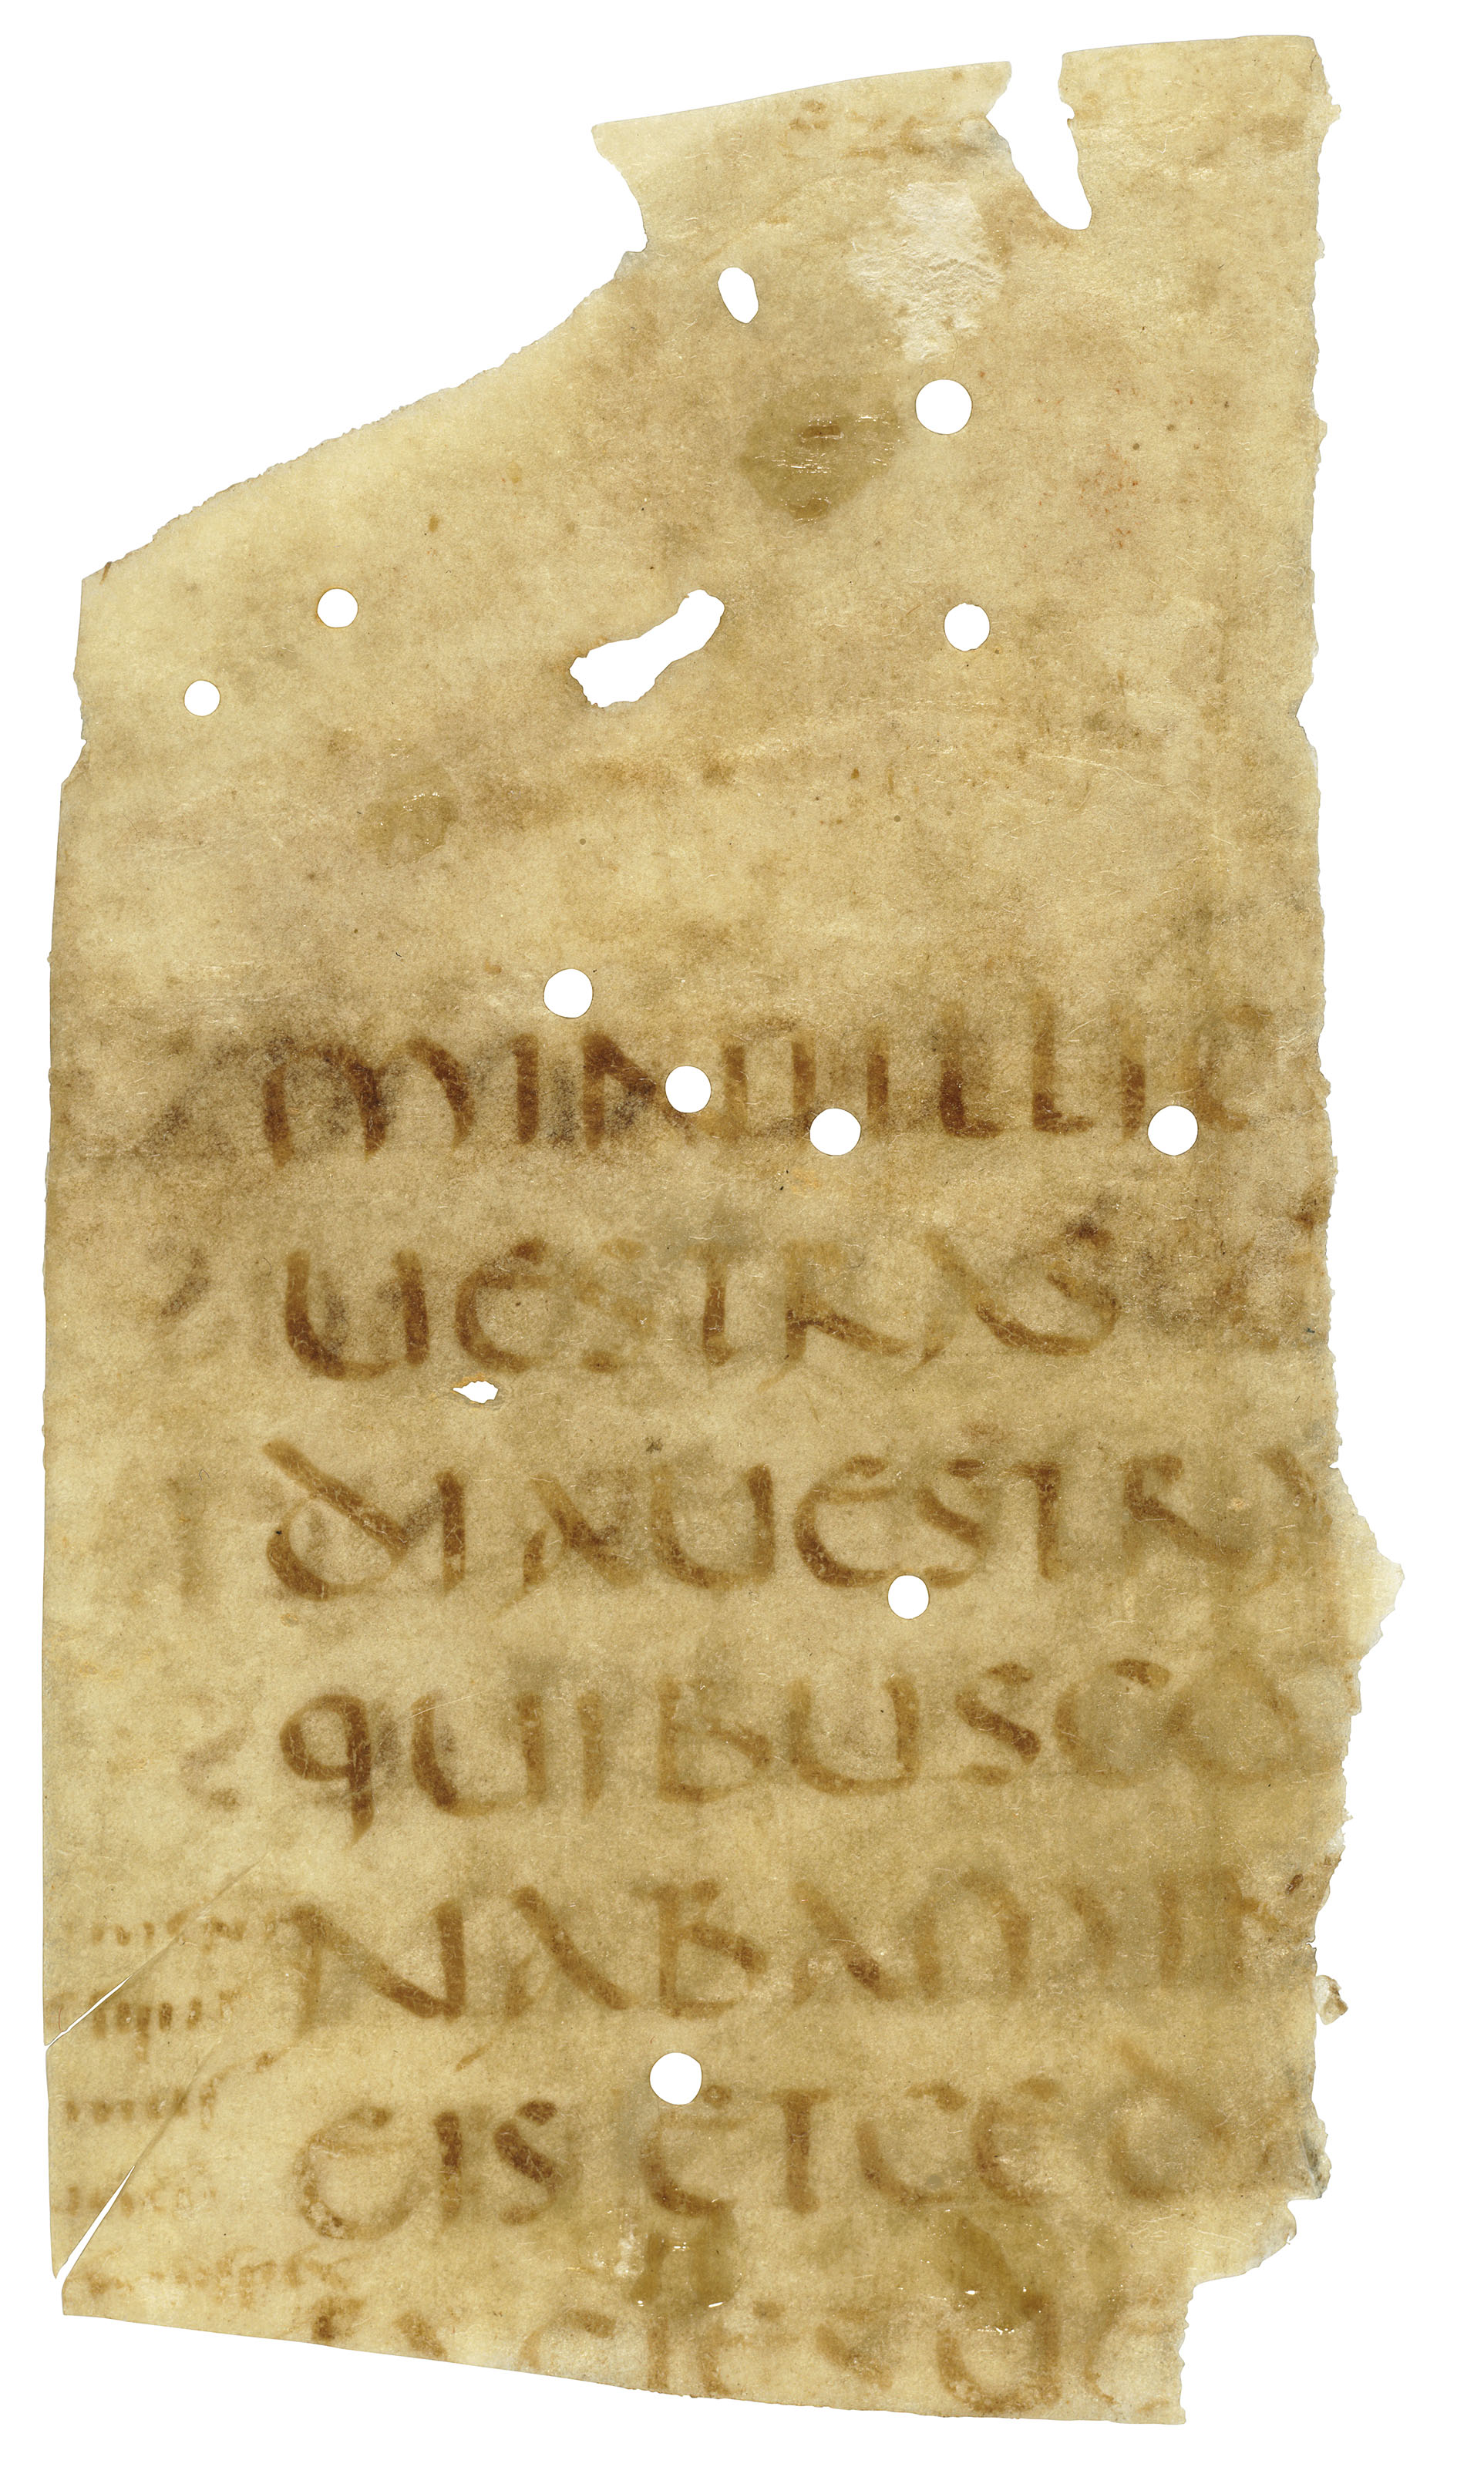 BIBLE, Ezechiel, in Latin, manuscript on vellum [northern Italy, 5th century]